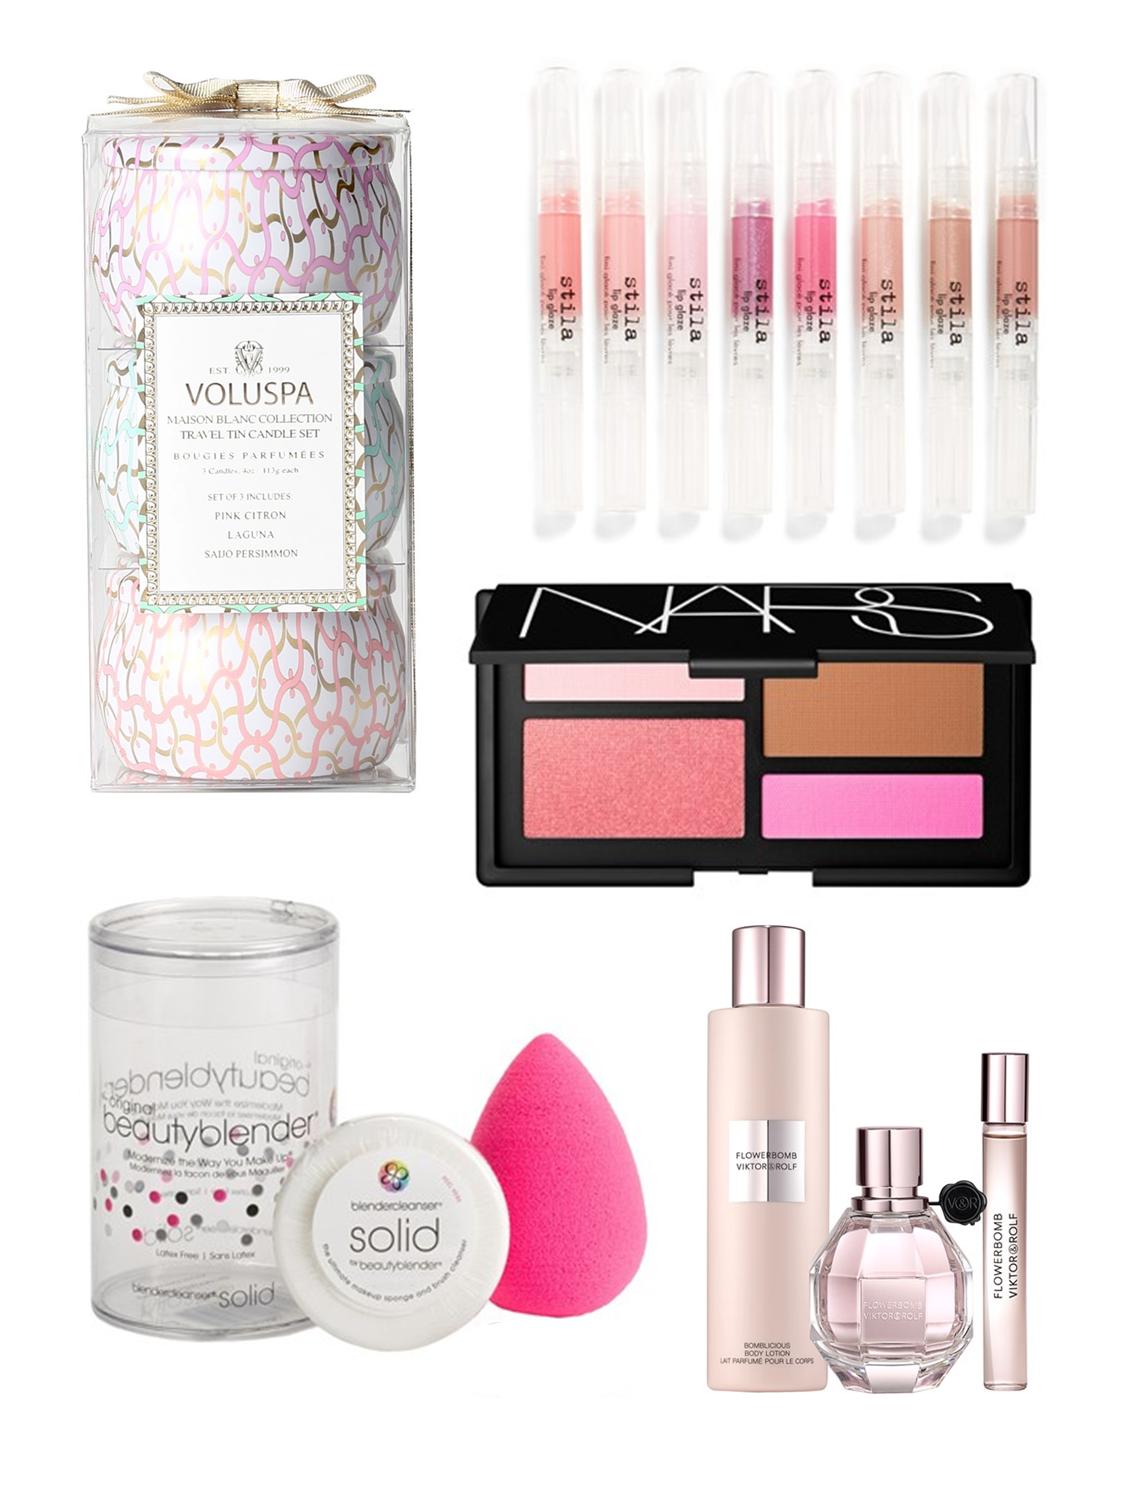 Anniversary Sale, NARS, Stila, Beauty Blender, Voluspa, Flowerbomb